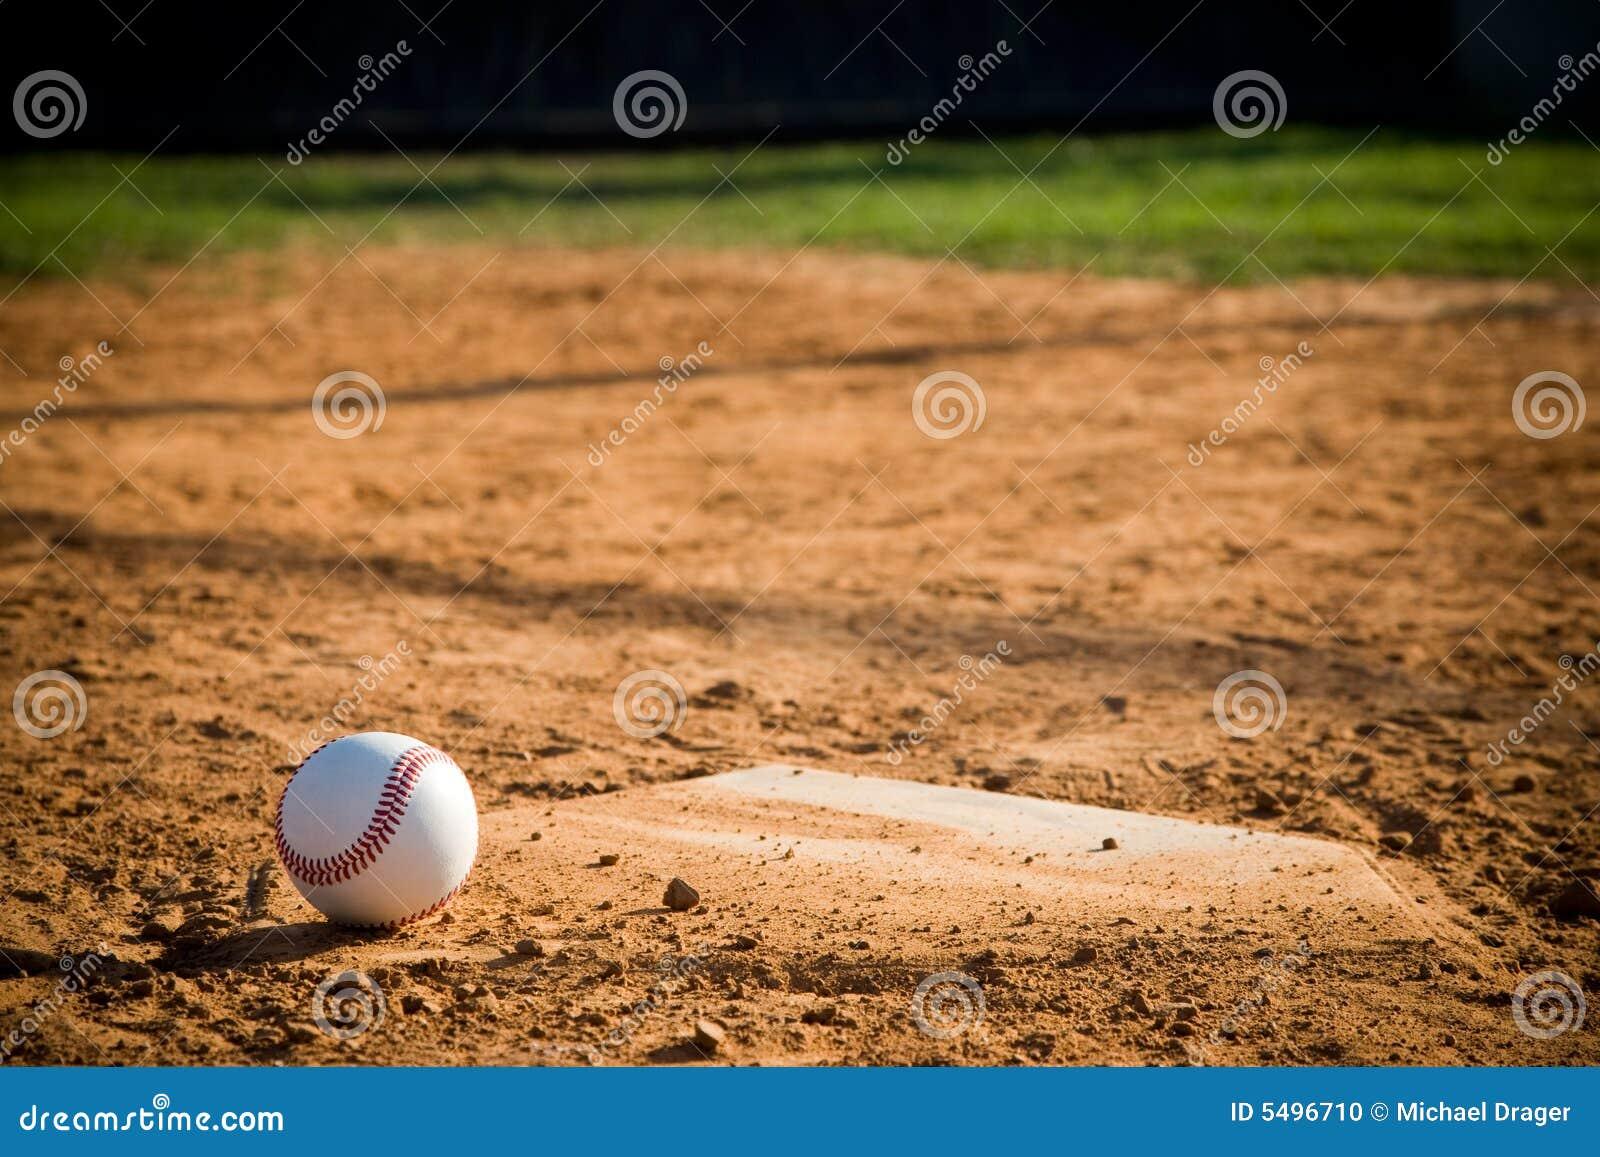 baseball homeplate with baseball on it stock photo image 5496710